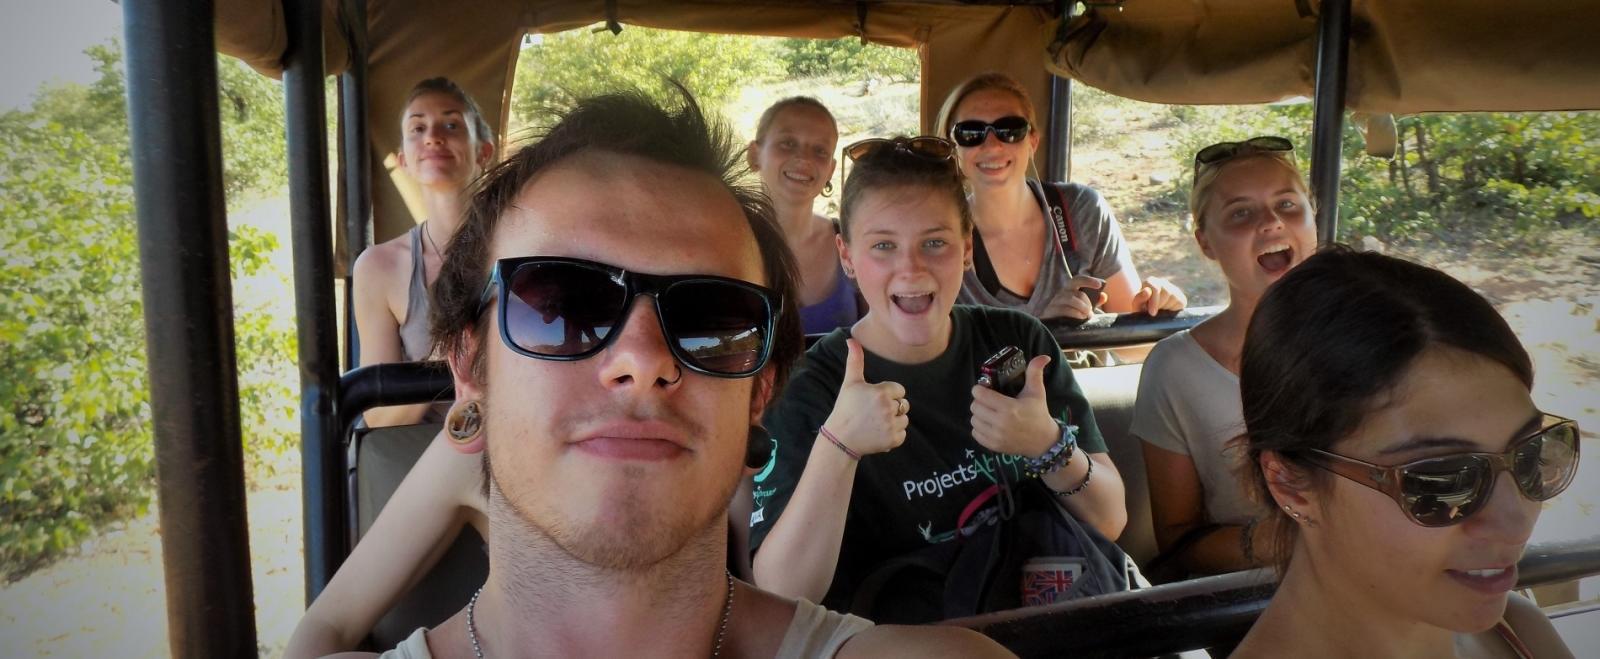 Voluntarios en Botsuana durante un safari.